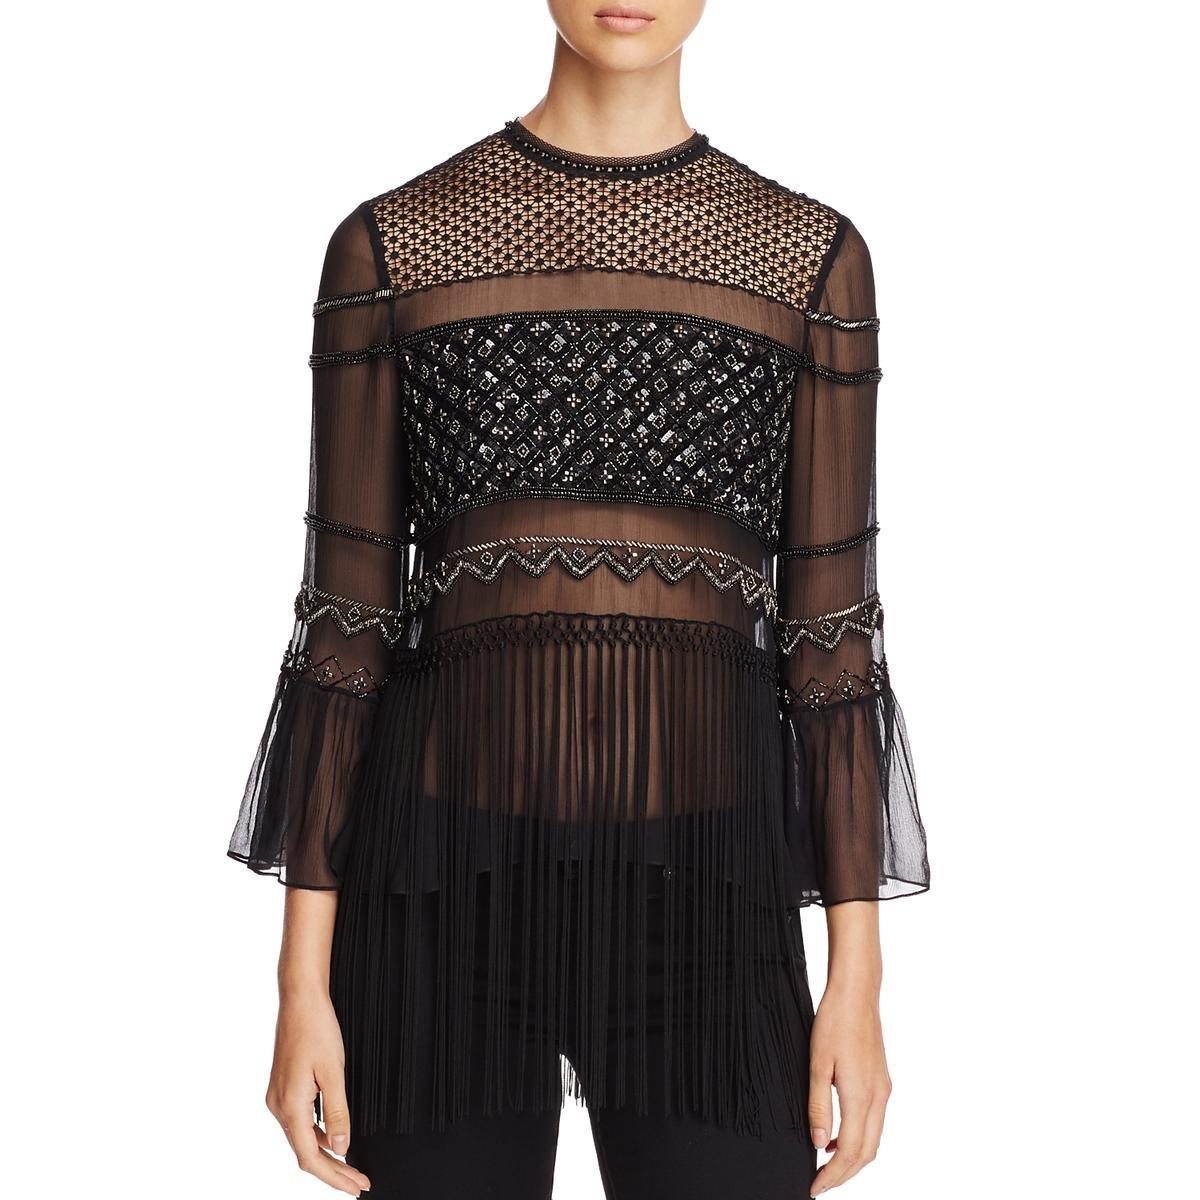 Elie Tahari Womens Aislin Silk Mixed Media Blouse Black XL